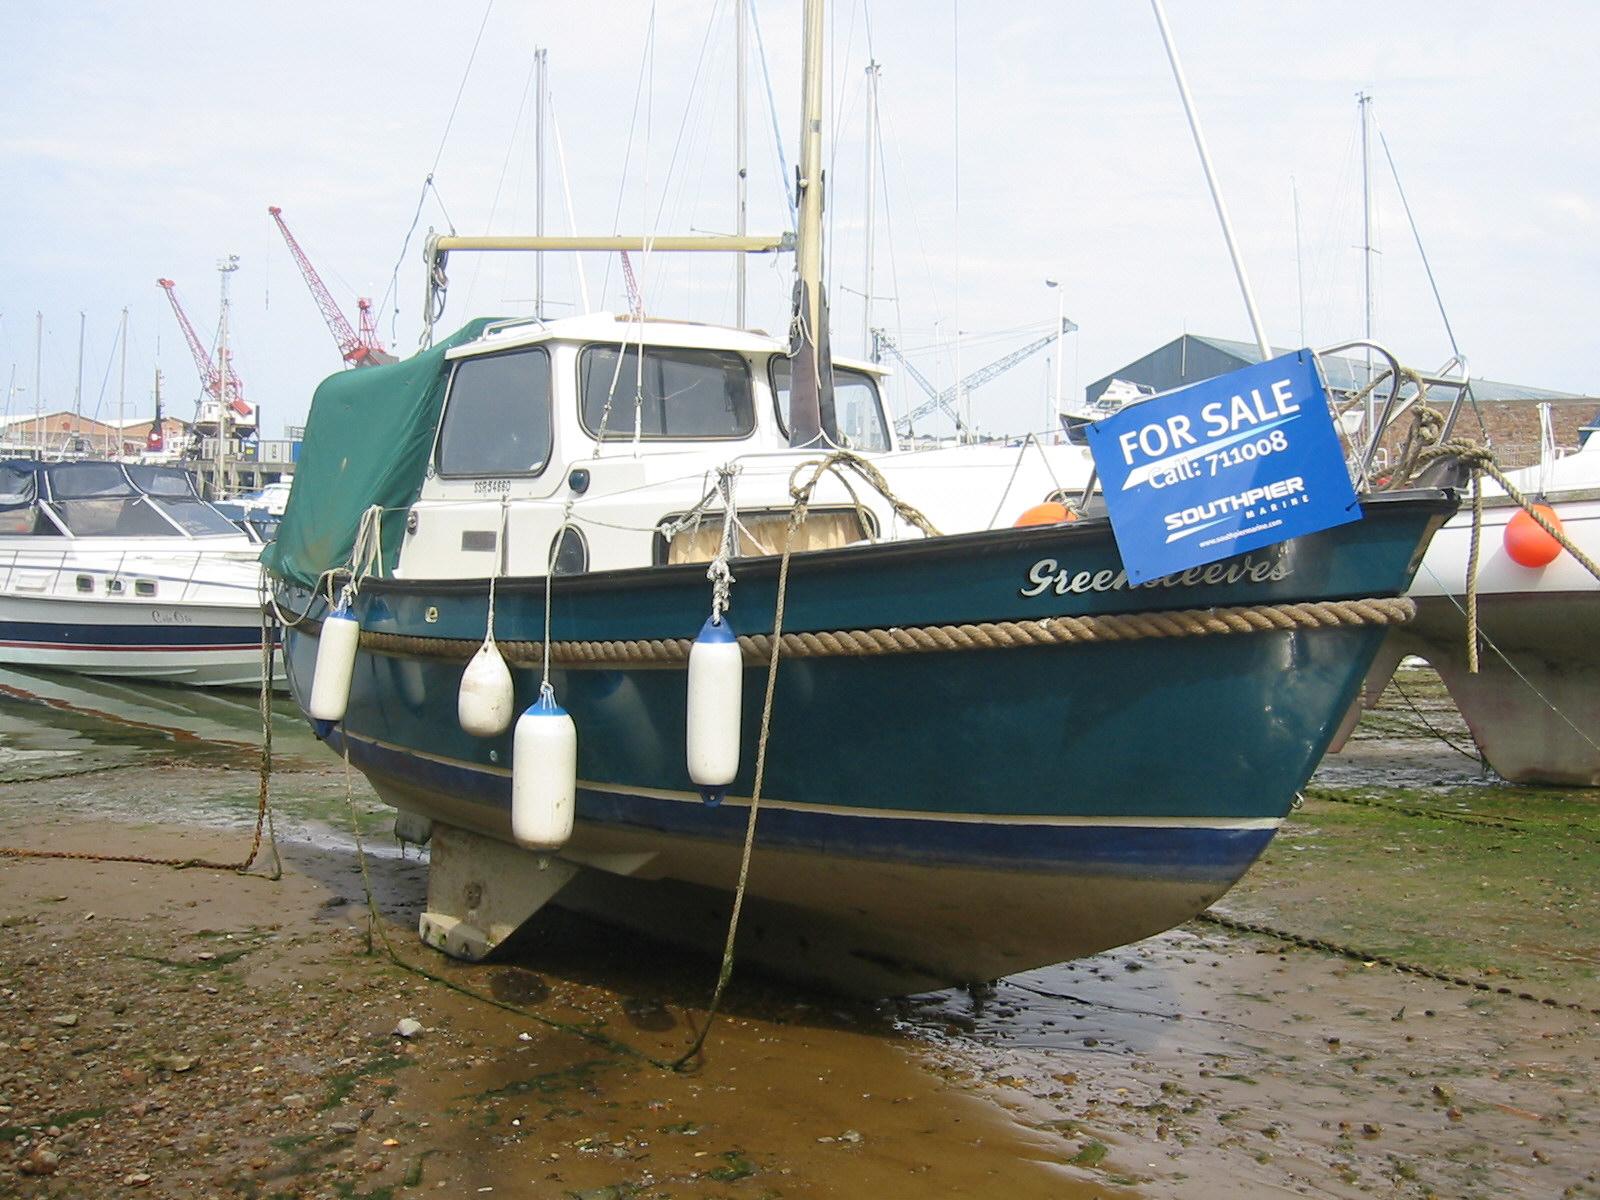 Simple Sailing Low Cost Cruising Hardy Motorsailer